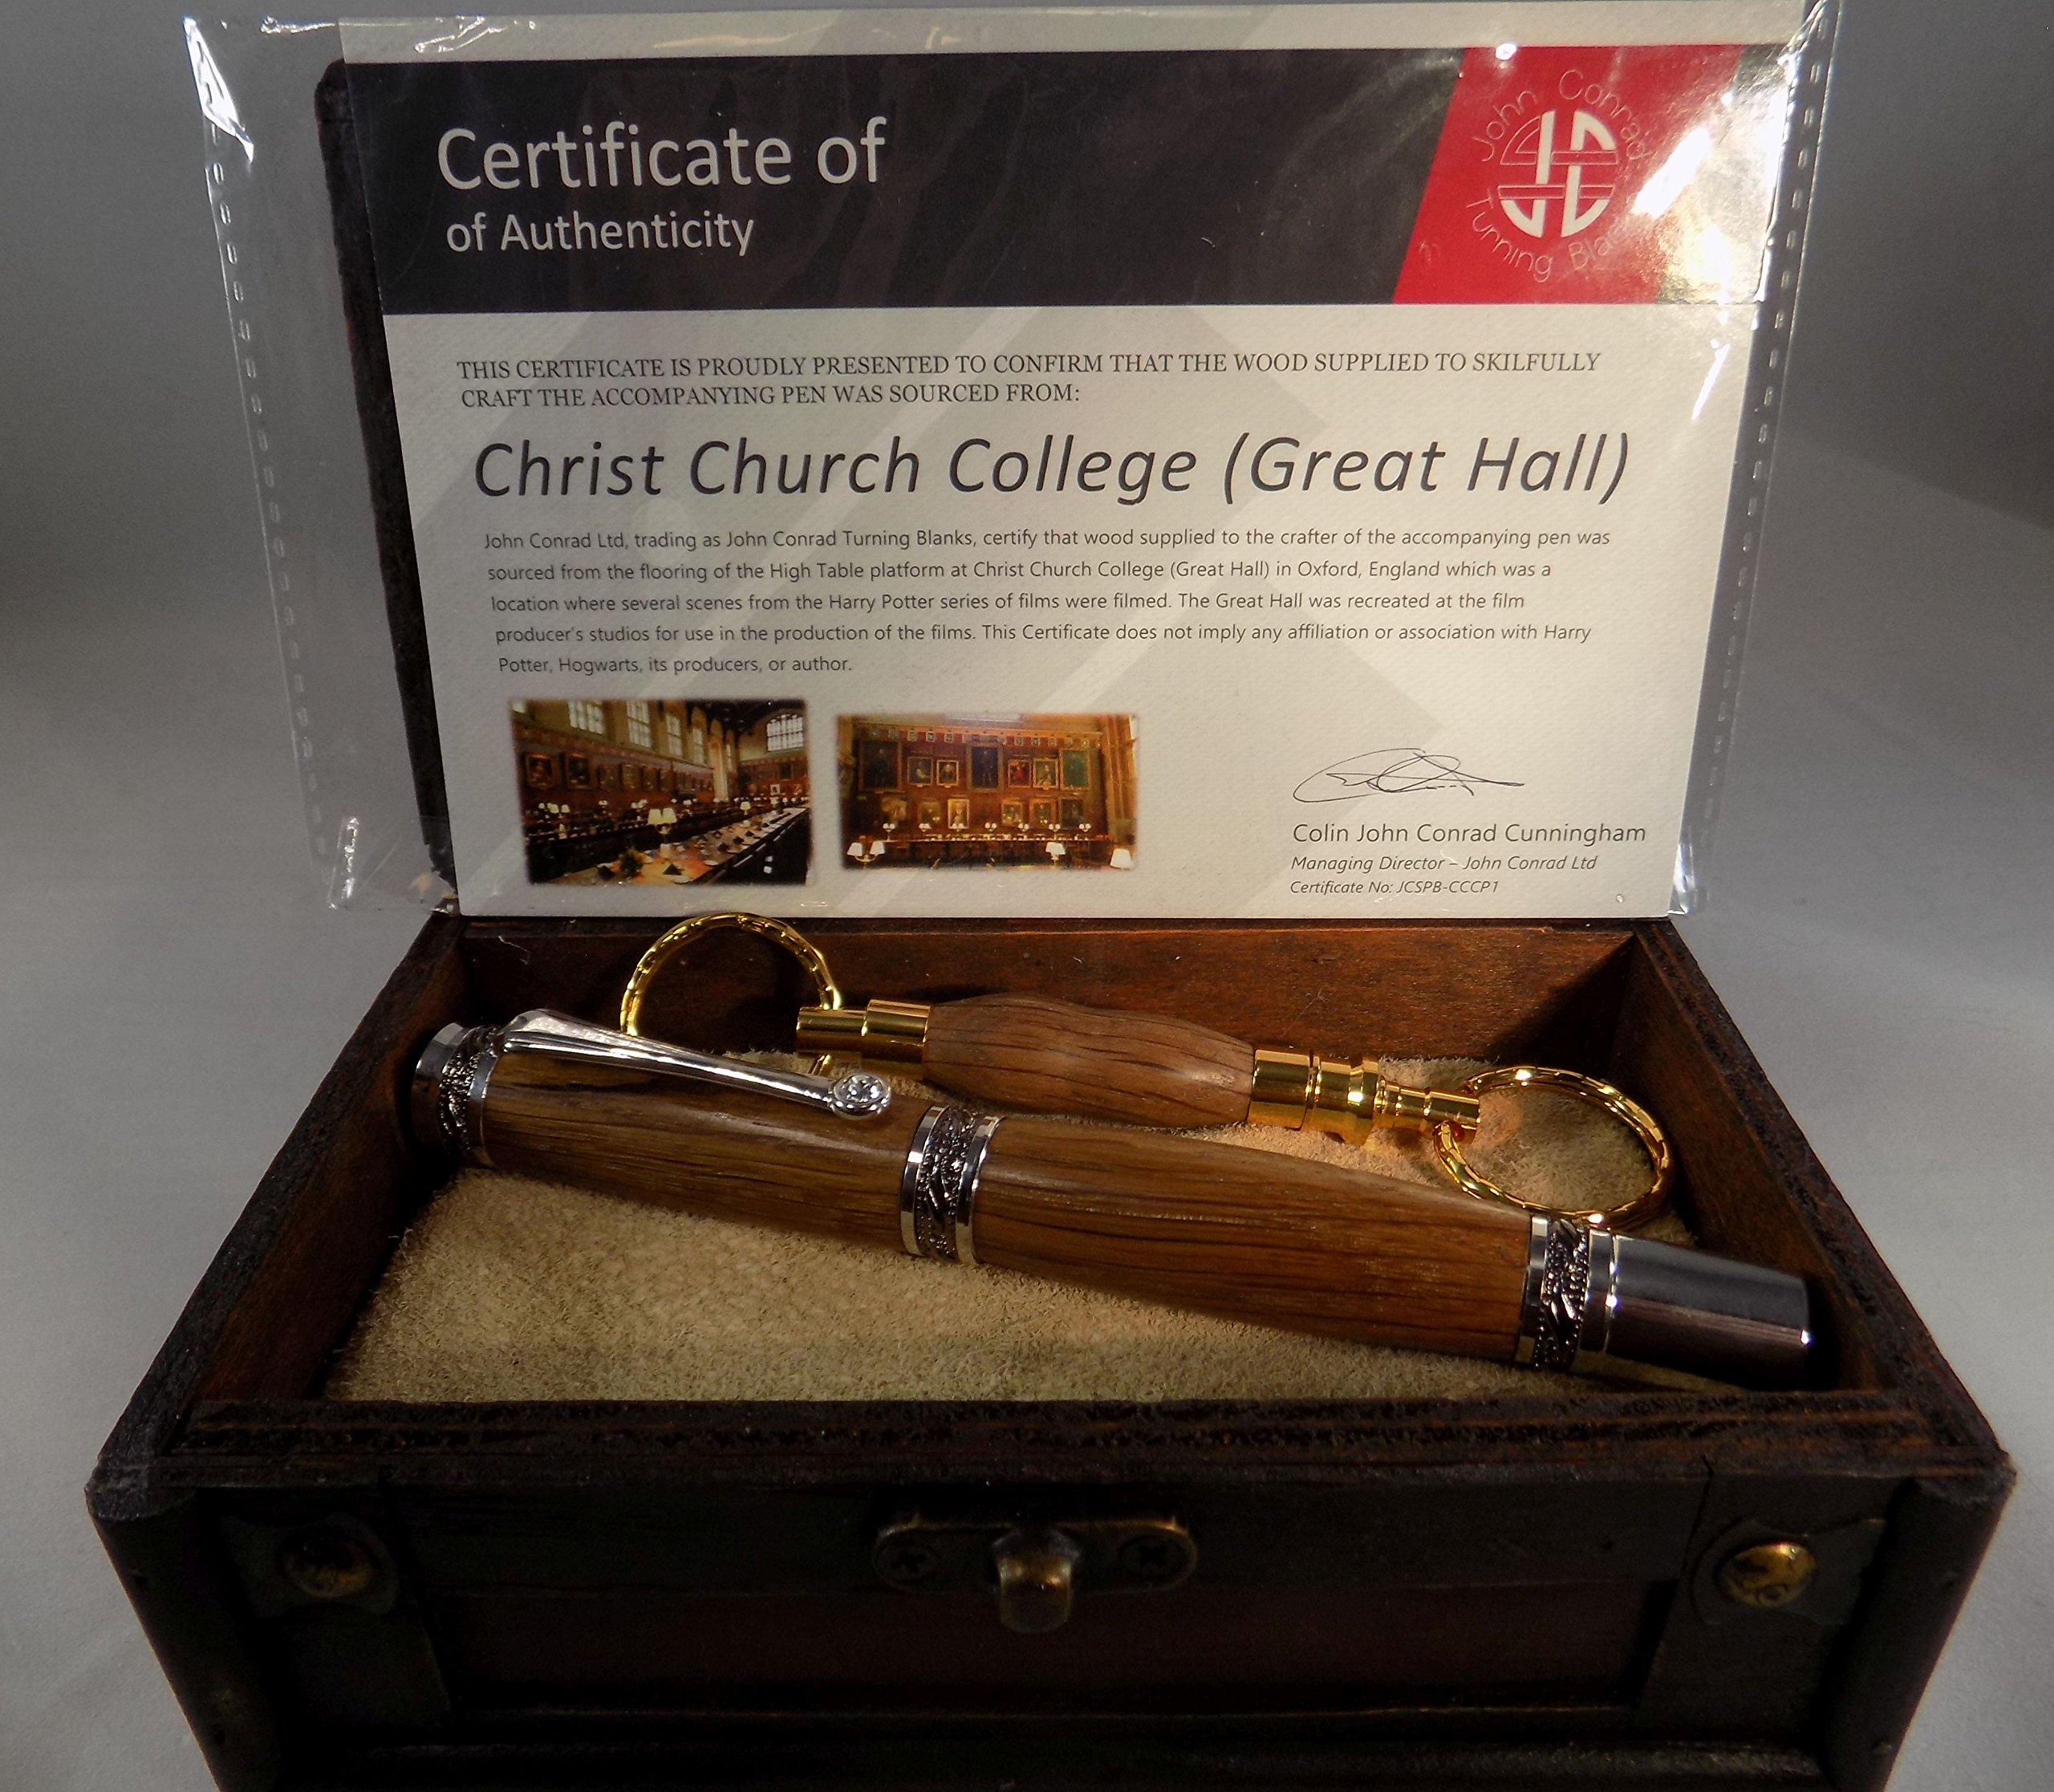 Handmade Majestic Rollerball Pen - Christ Church College (Hogwarts Great Hall) Wood Floor - Keychain - Certificate of Authenticity - Black Titanium and Rhodium Hardware - Gift Box